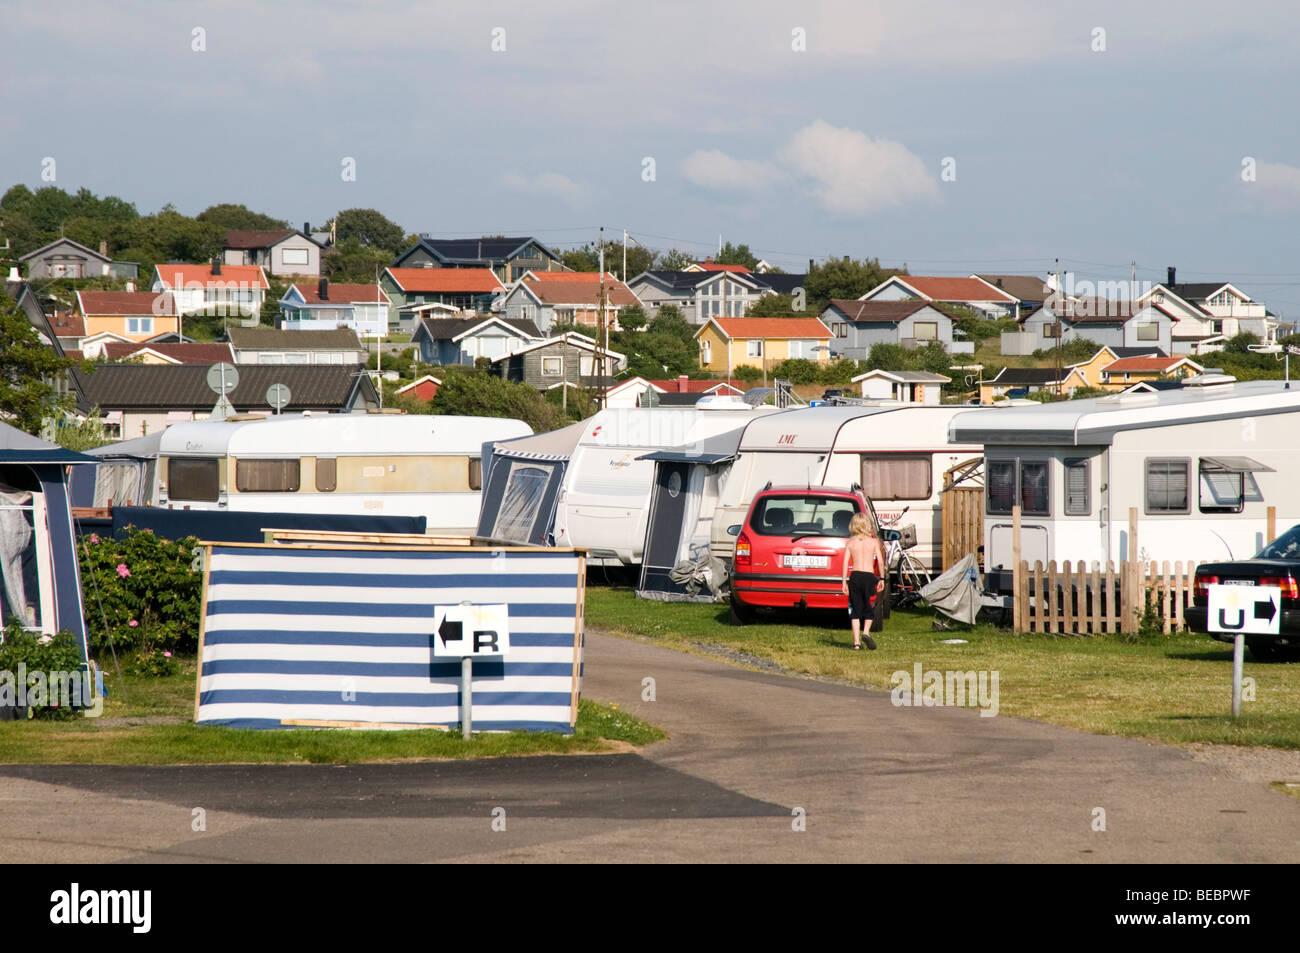 caravan caravans site camping holiday vacation holidays vacations sweden swedish campsite campsites holidaymakers - Stock Image